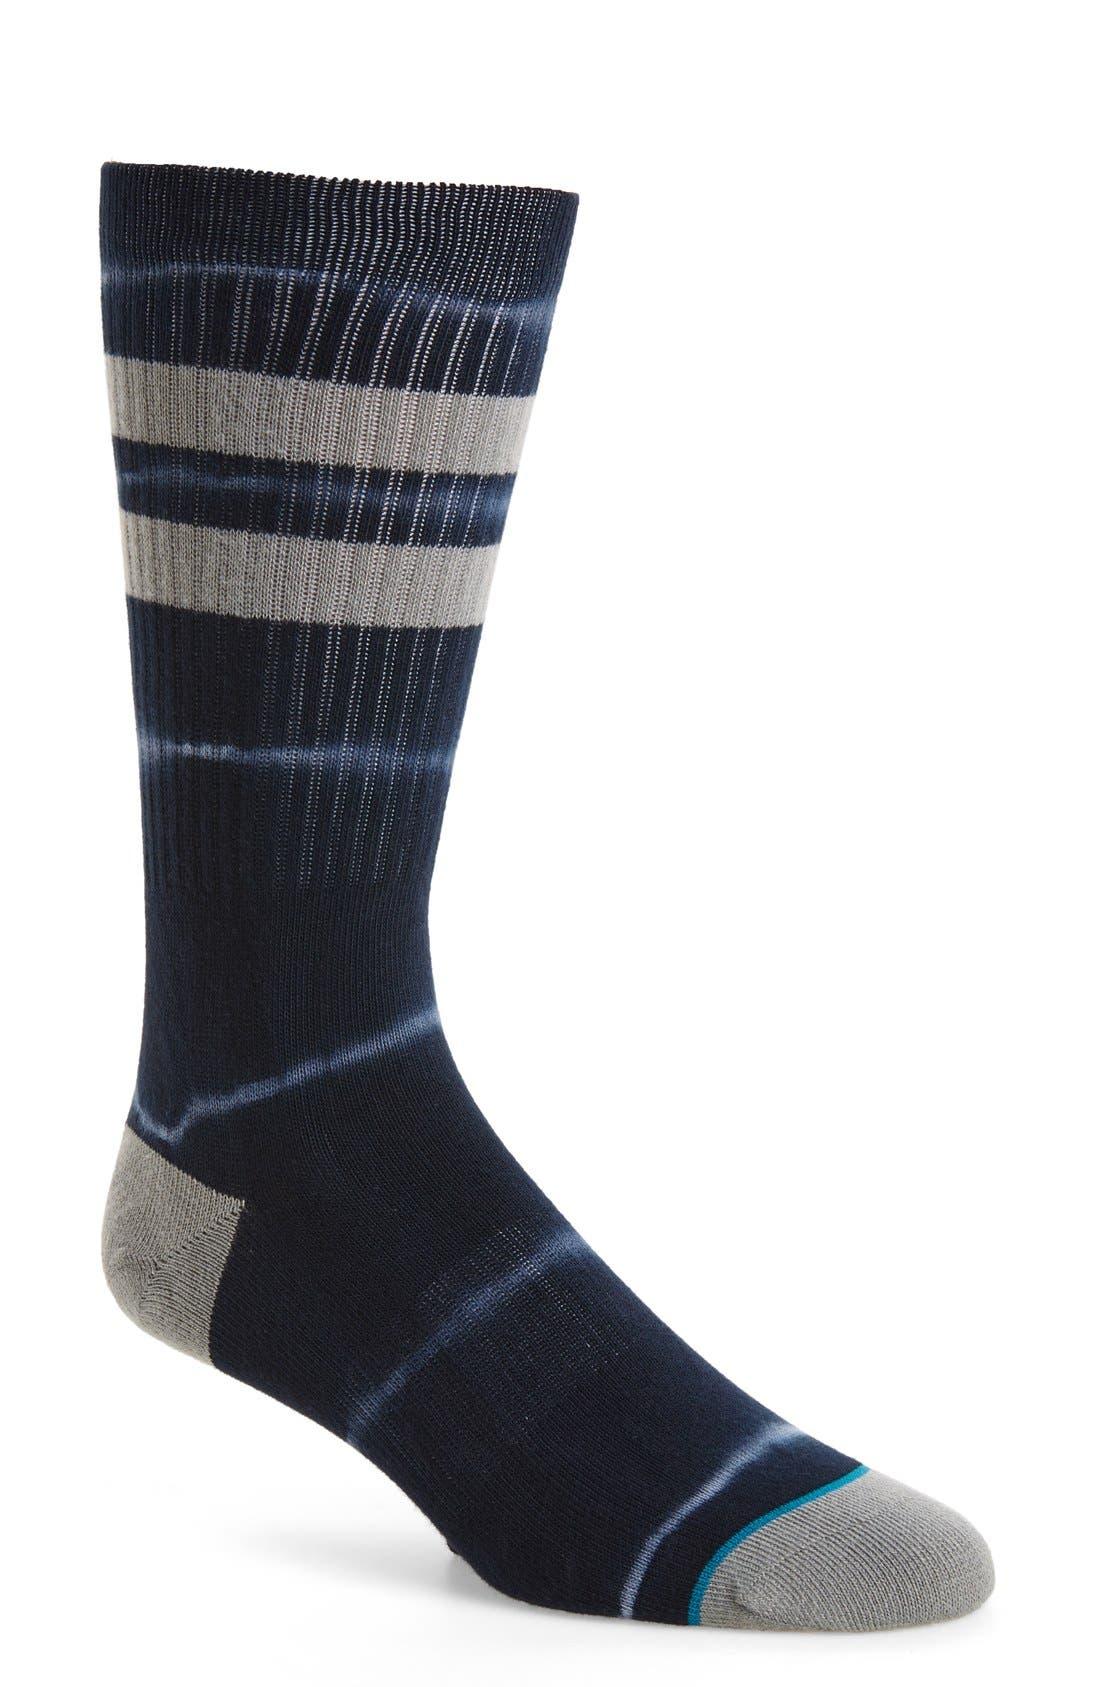 6AM Classic Crew Socks,                             Main thumbnail 1, color,                             001